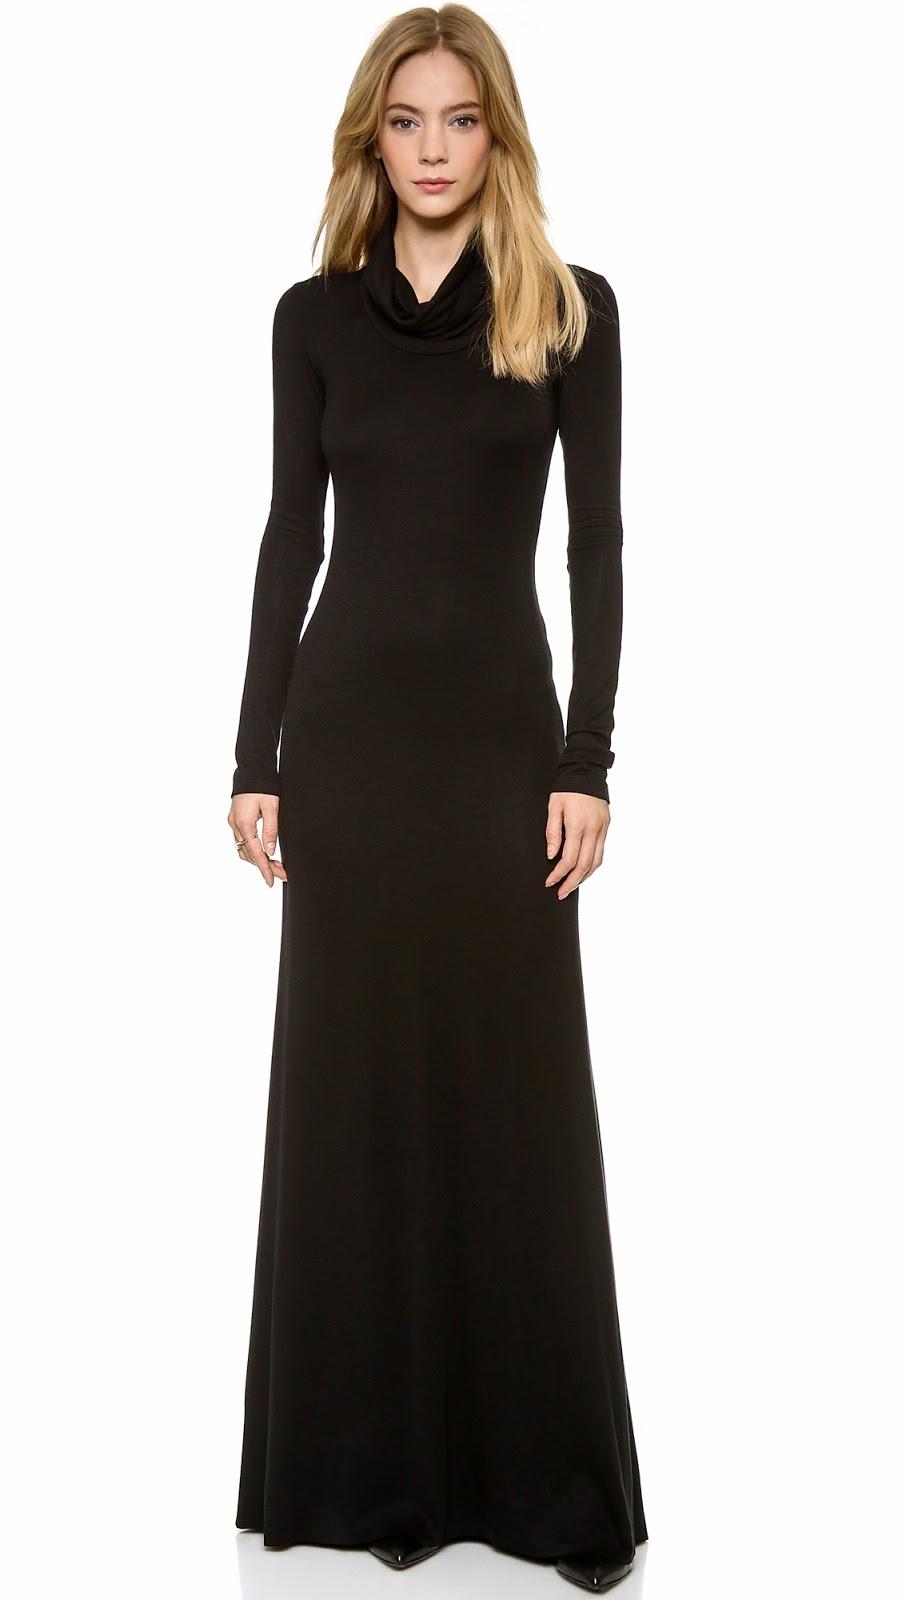 Modest maxi dress with sleeves   Follow Mode-sty for stylish modest clothing #nolayering tznius orthodox jewish muslim hijab mormon lds pentecostal islamic evangelical christian